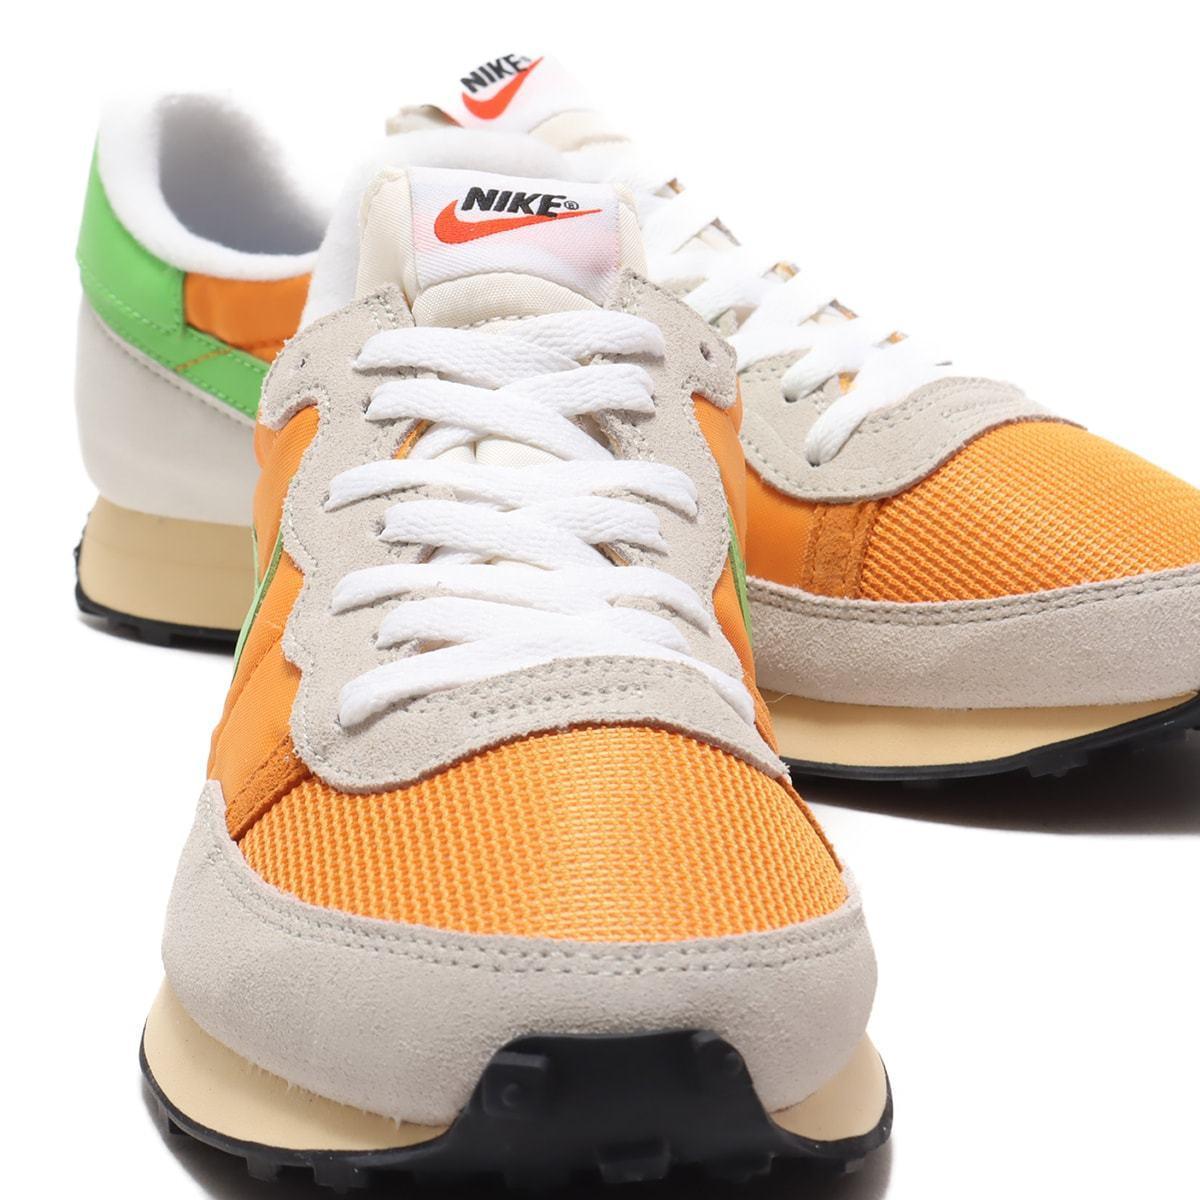 "细节实拍展示金桔黄/星云绿/浅骨色Nike Challenger OG ""Label Maker"""